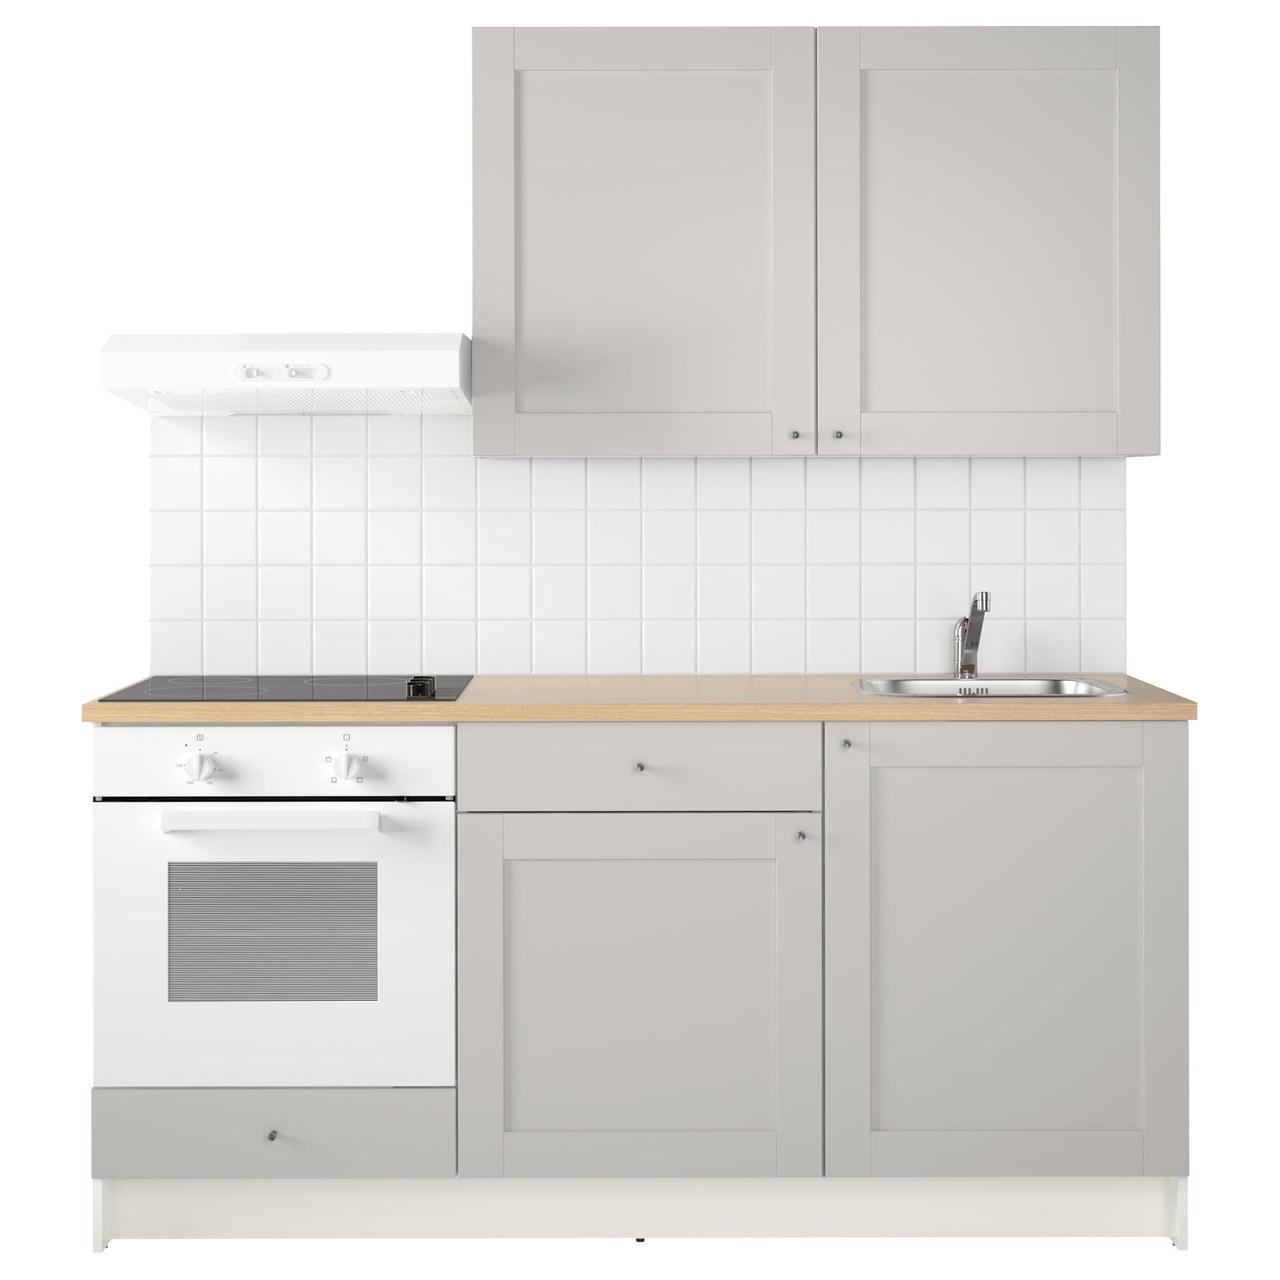 КНОКСХУЛЬТ Кухня, серый